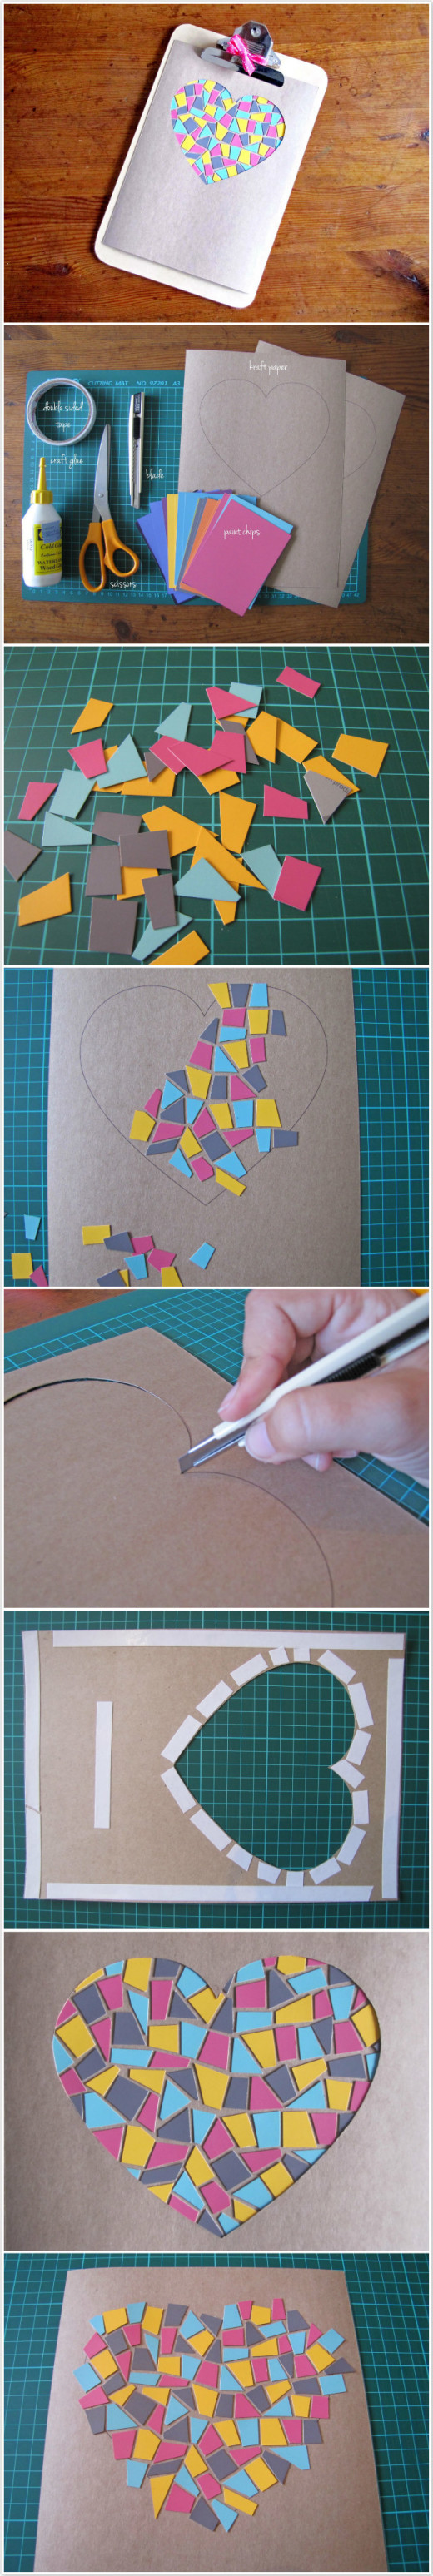 DIY: Paint Chip Mosaic Artwork